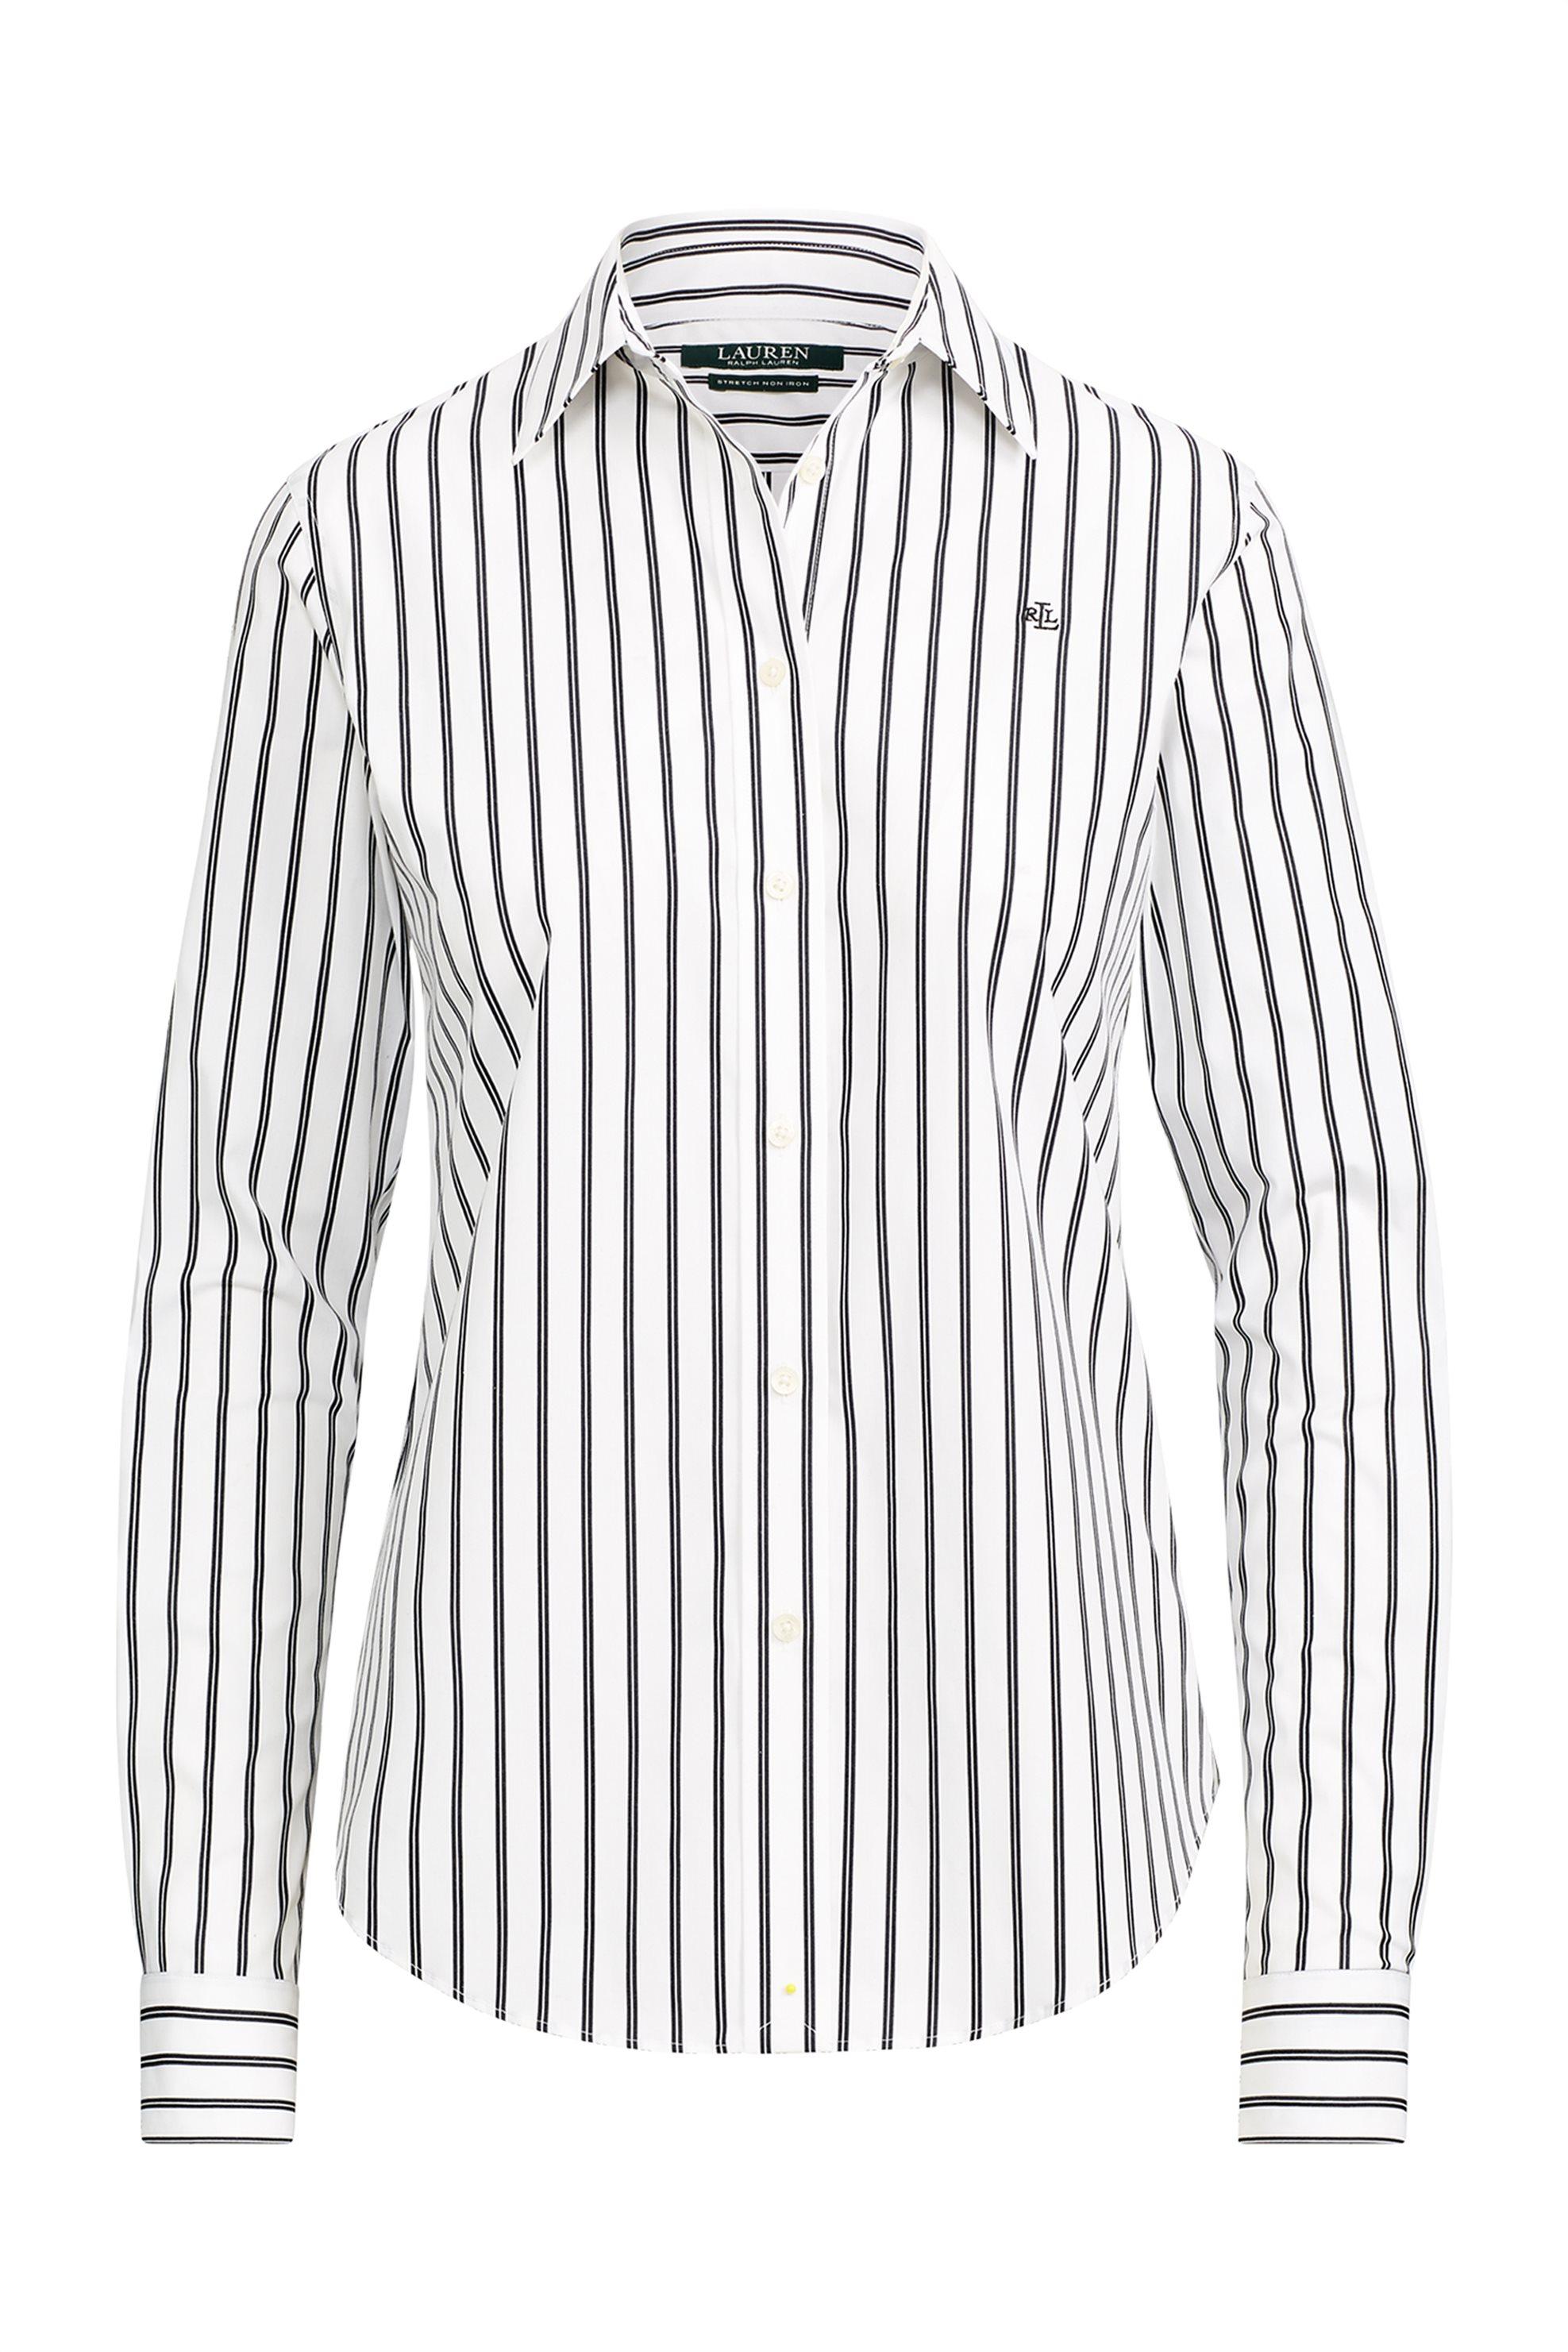 Lauren Ralph Lauren γυναικείo ριγέ πουκάμισο Striped Button-Down - 200725882001  γυναικα   ρουχα   tops   πουκάμισα   casual